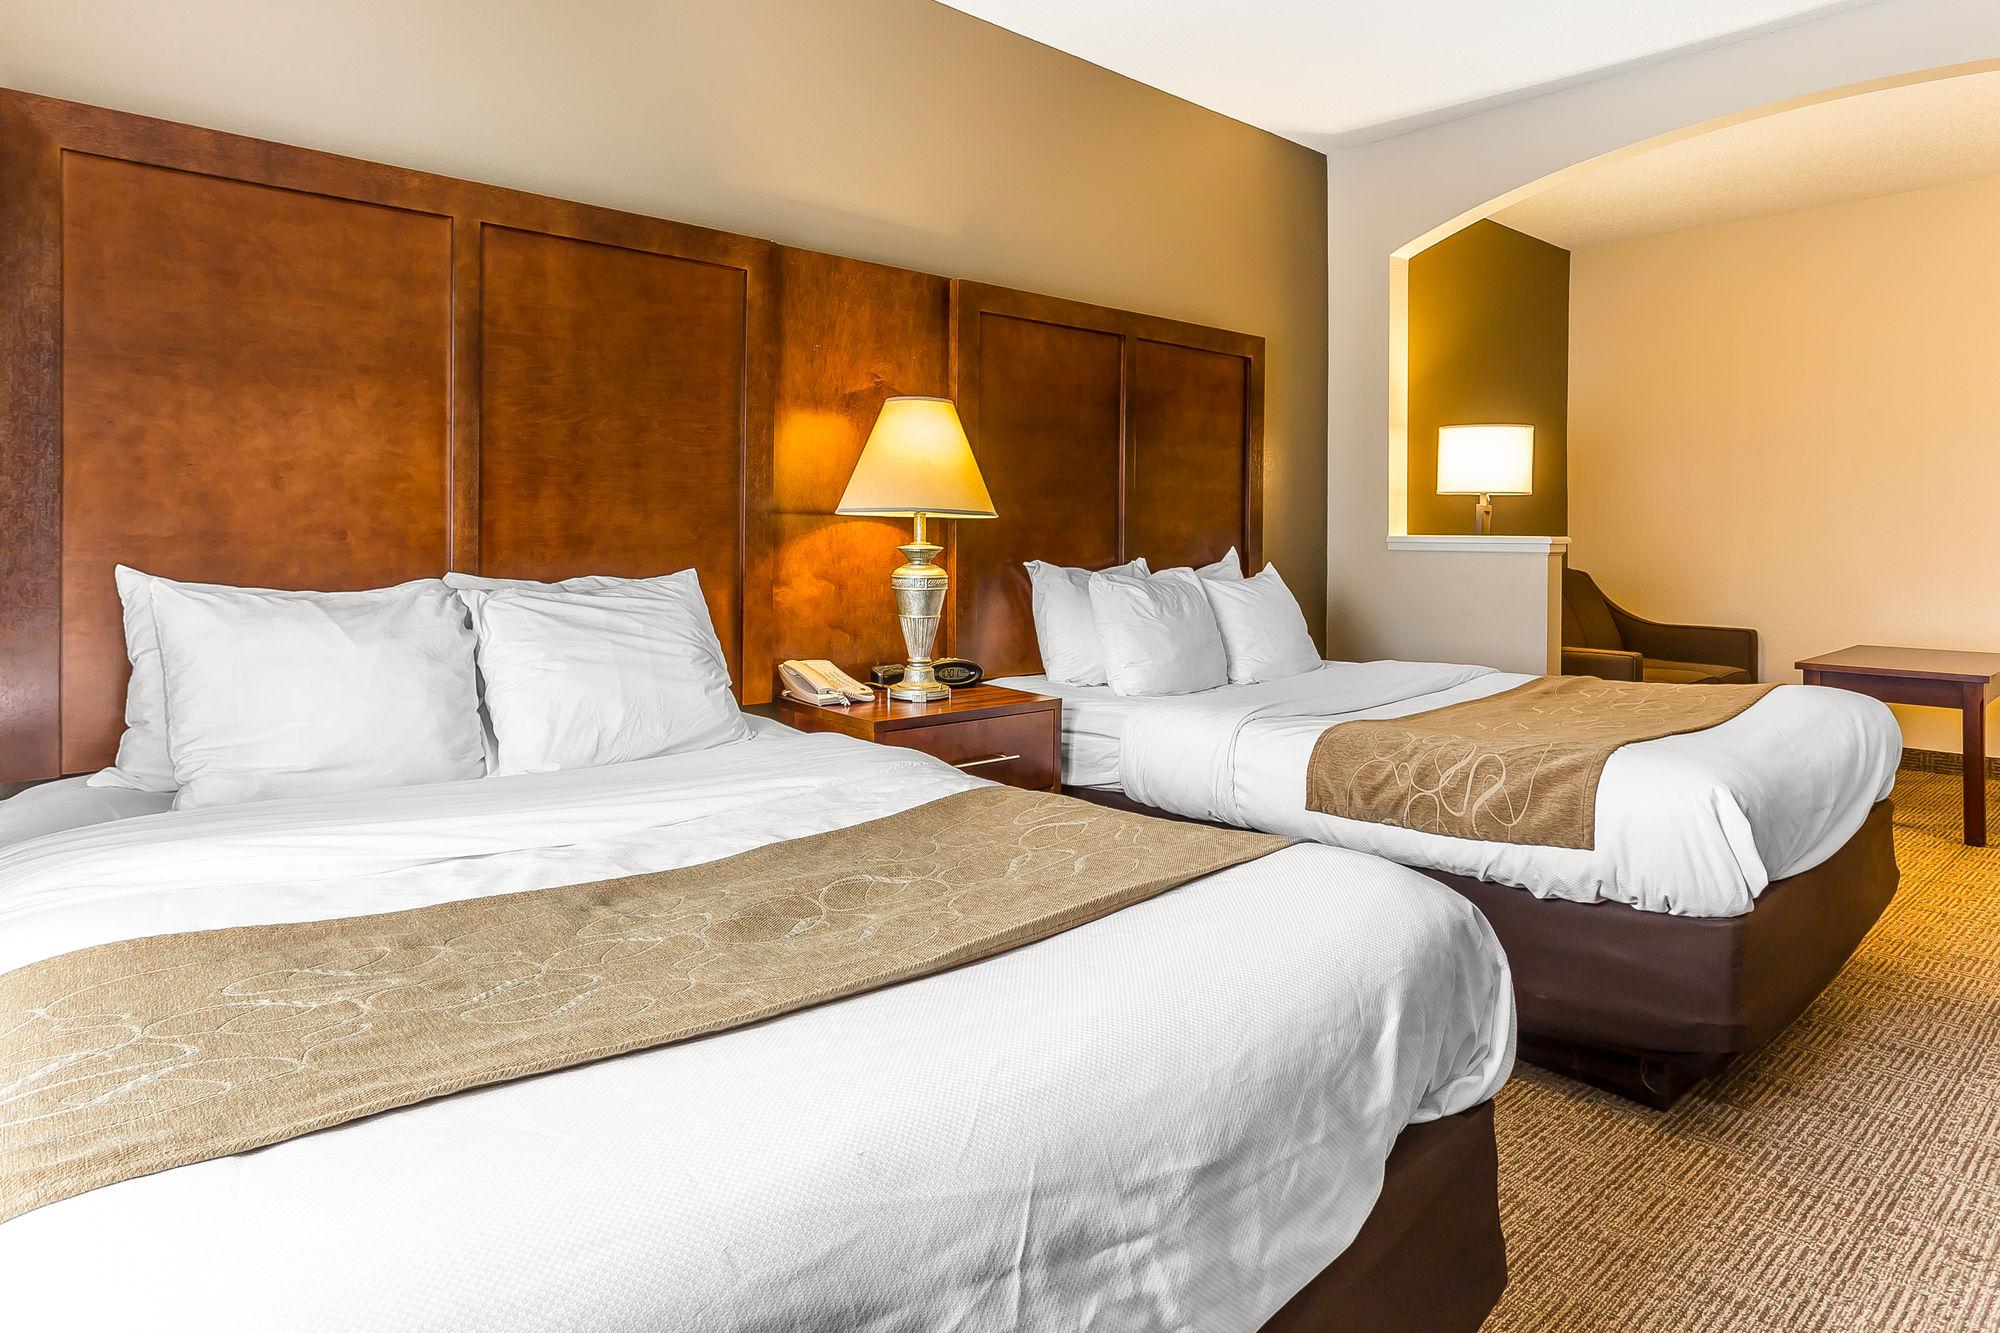 Comfort Suites Myrtle Beach in Myrtle Beach, SC